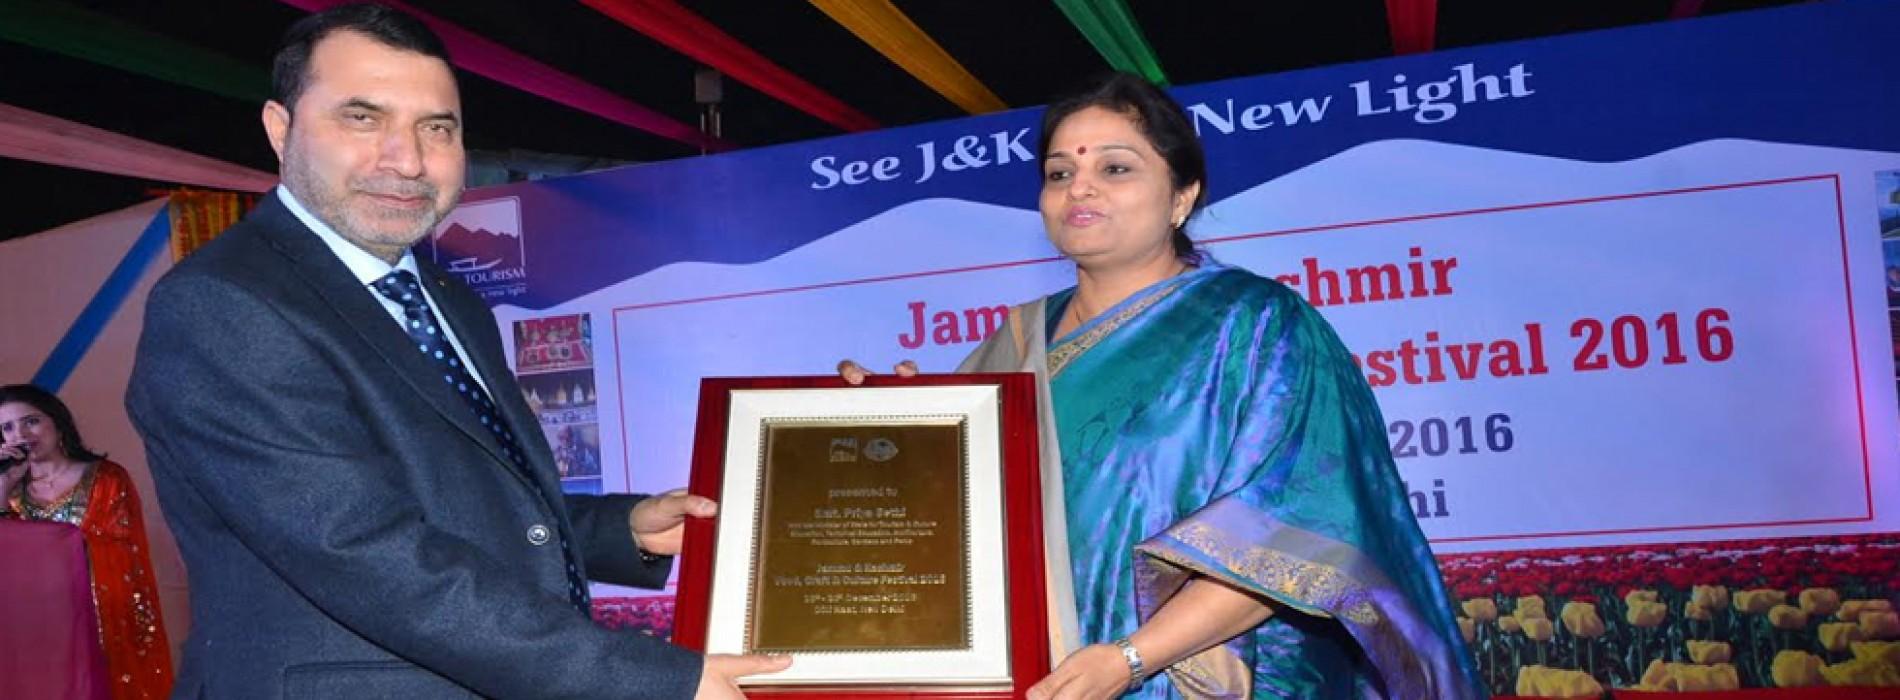 Priya Sethi inaugurates J&K Tourism Food, Craft & Culture Festival 2016 at Dilli Haat